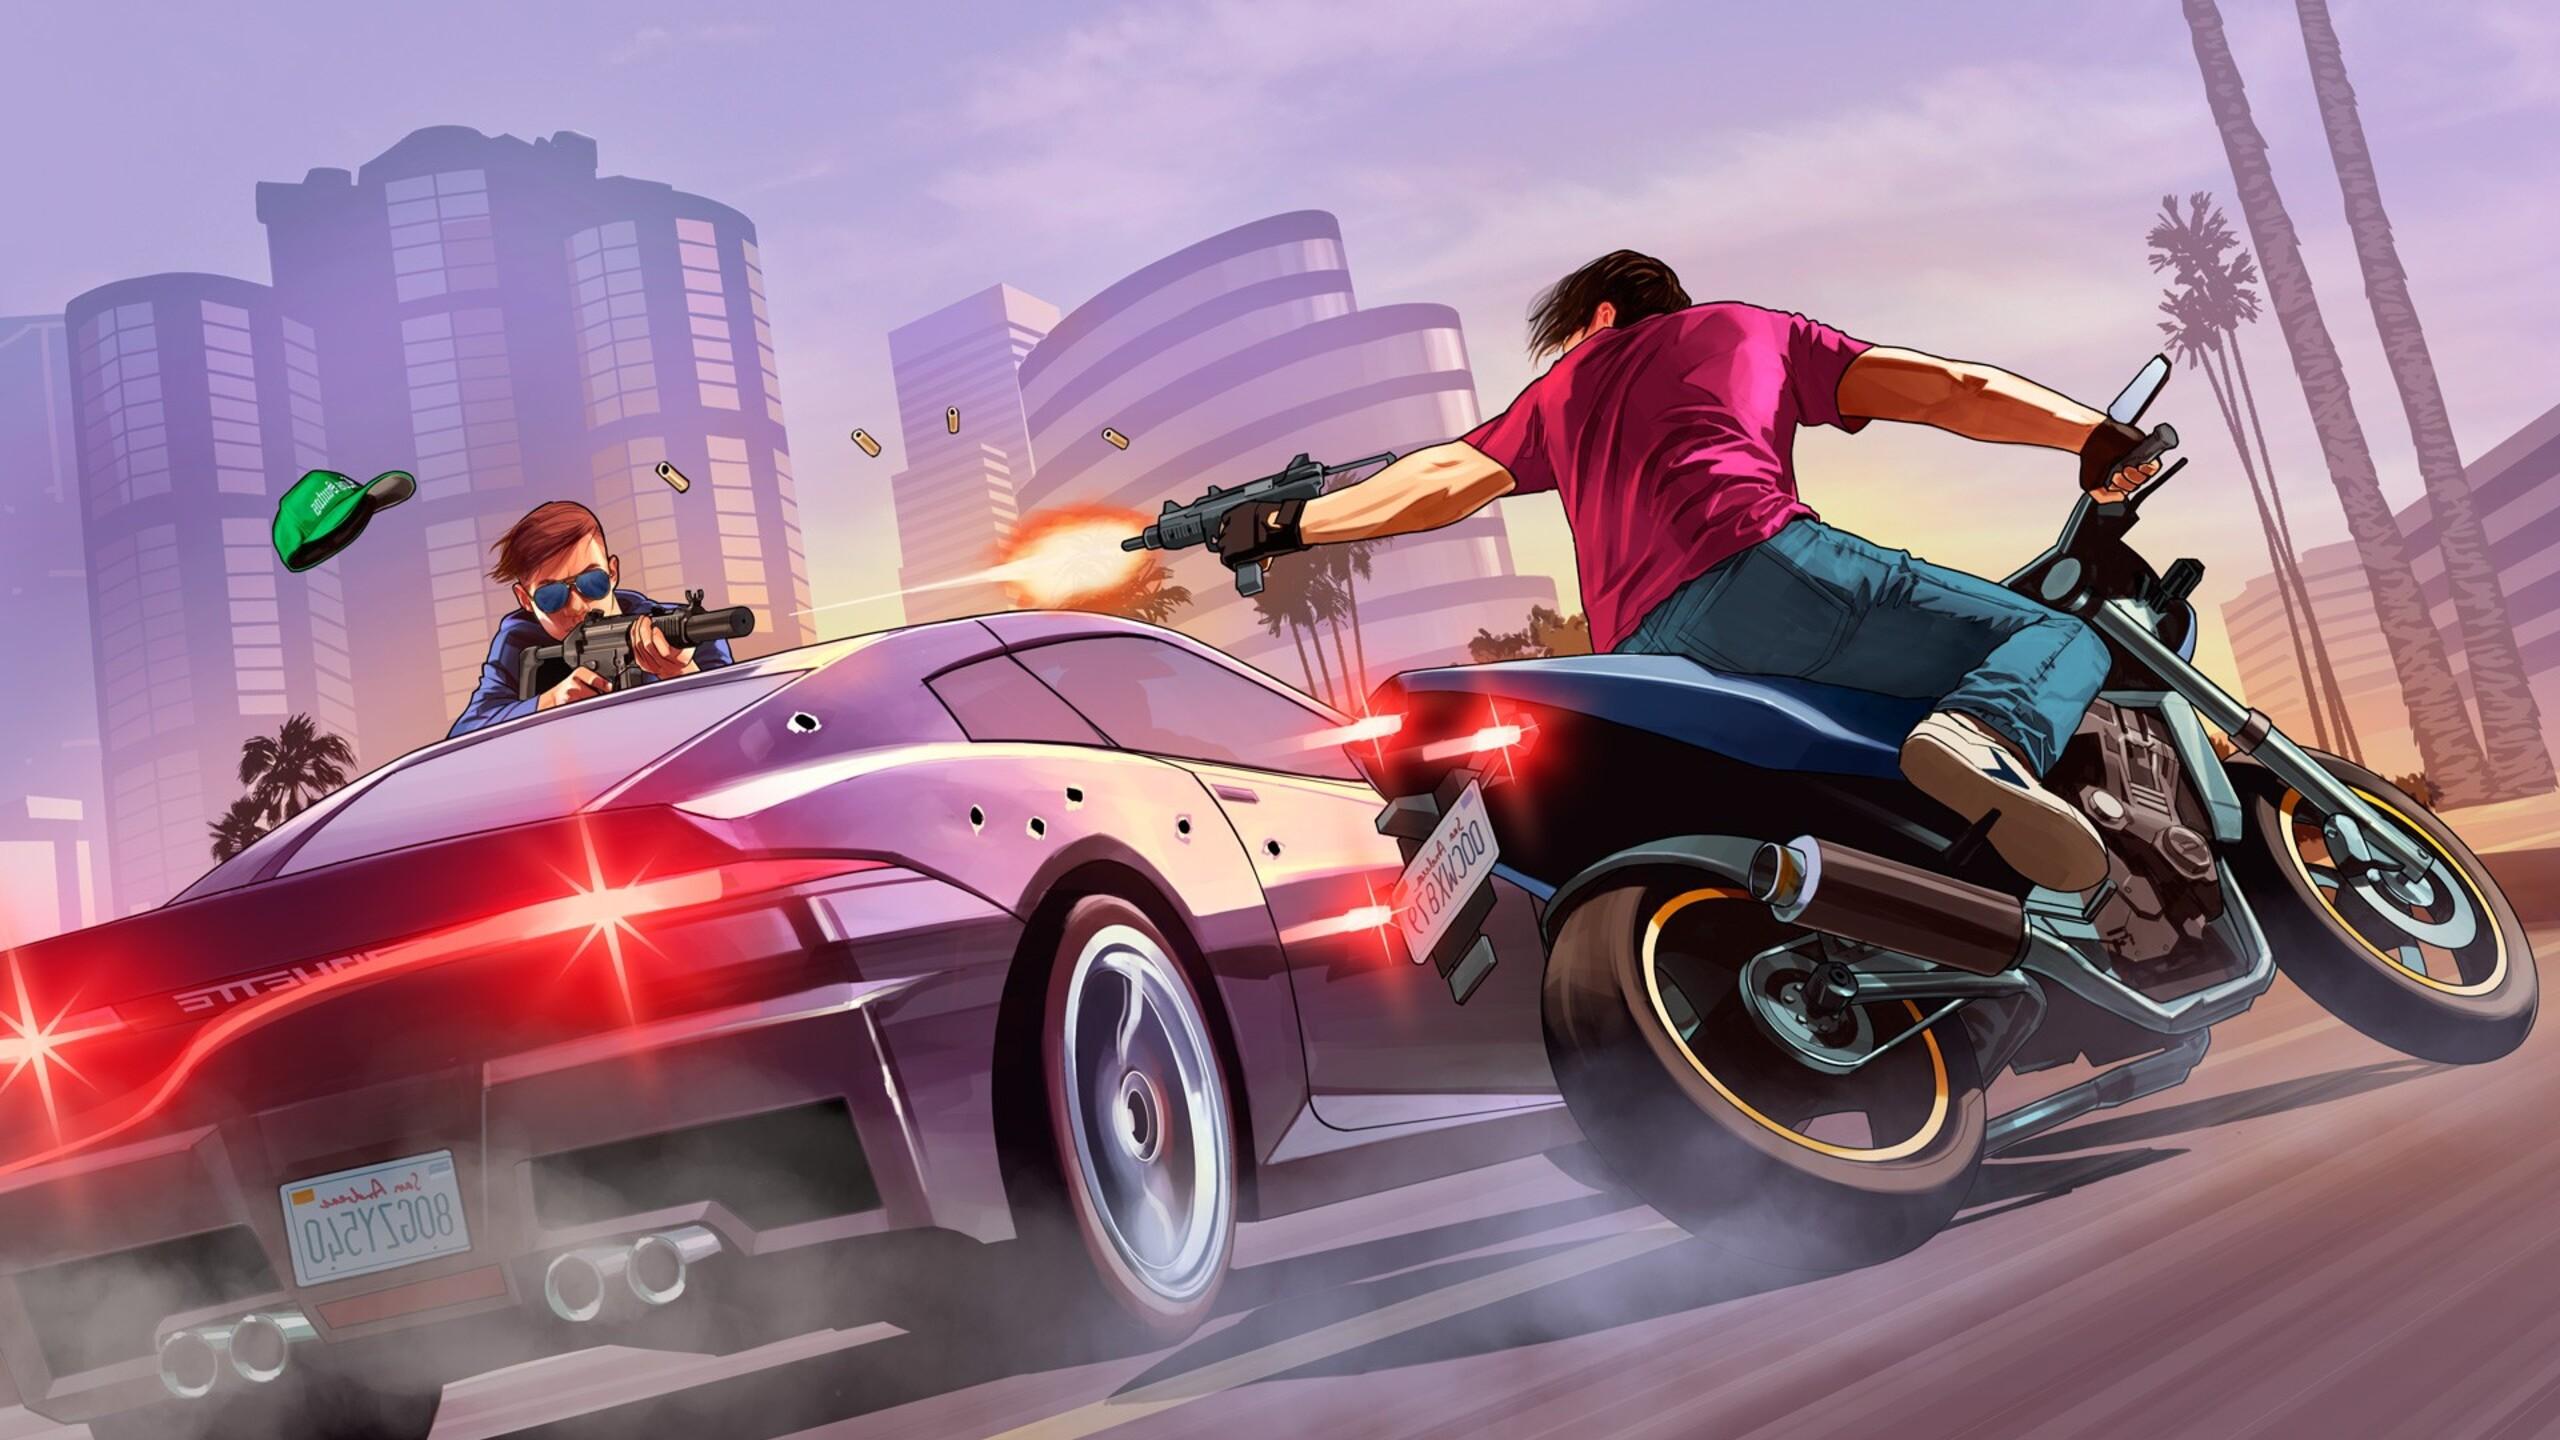 Girl Superheroes Wallpaper 1440p 2560x1440 Gta 5 Street Fight 1440p Resolution Hd 4k